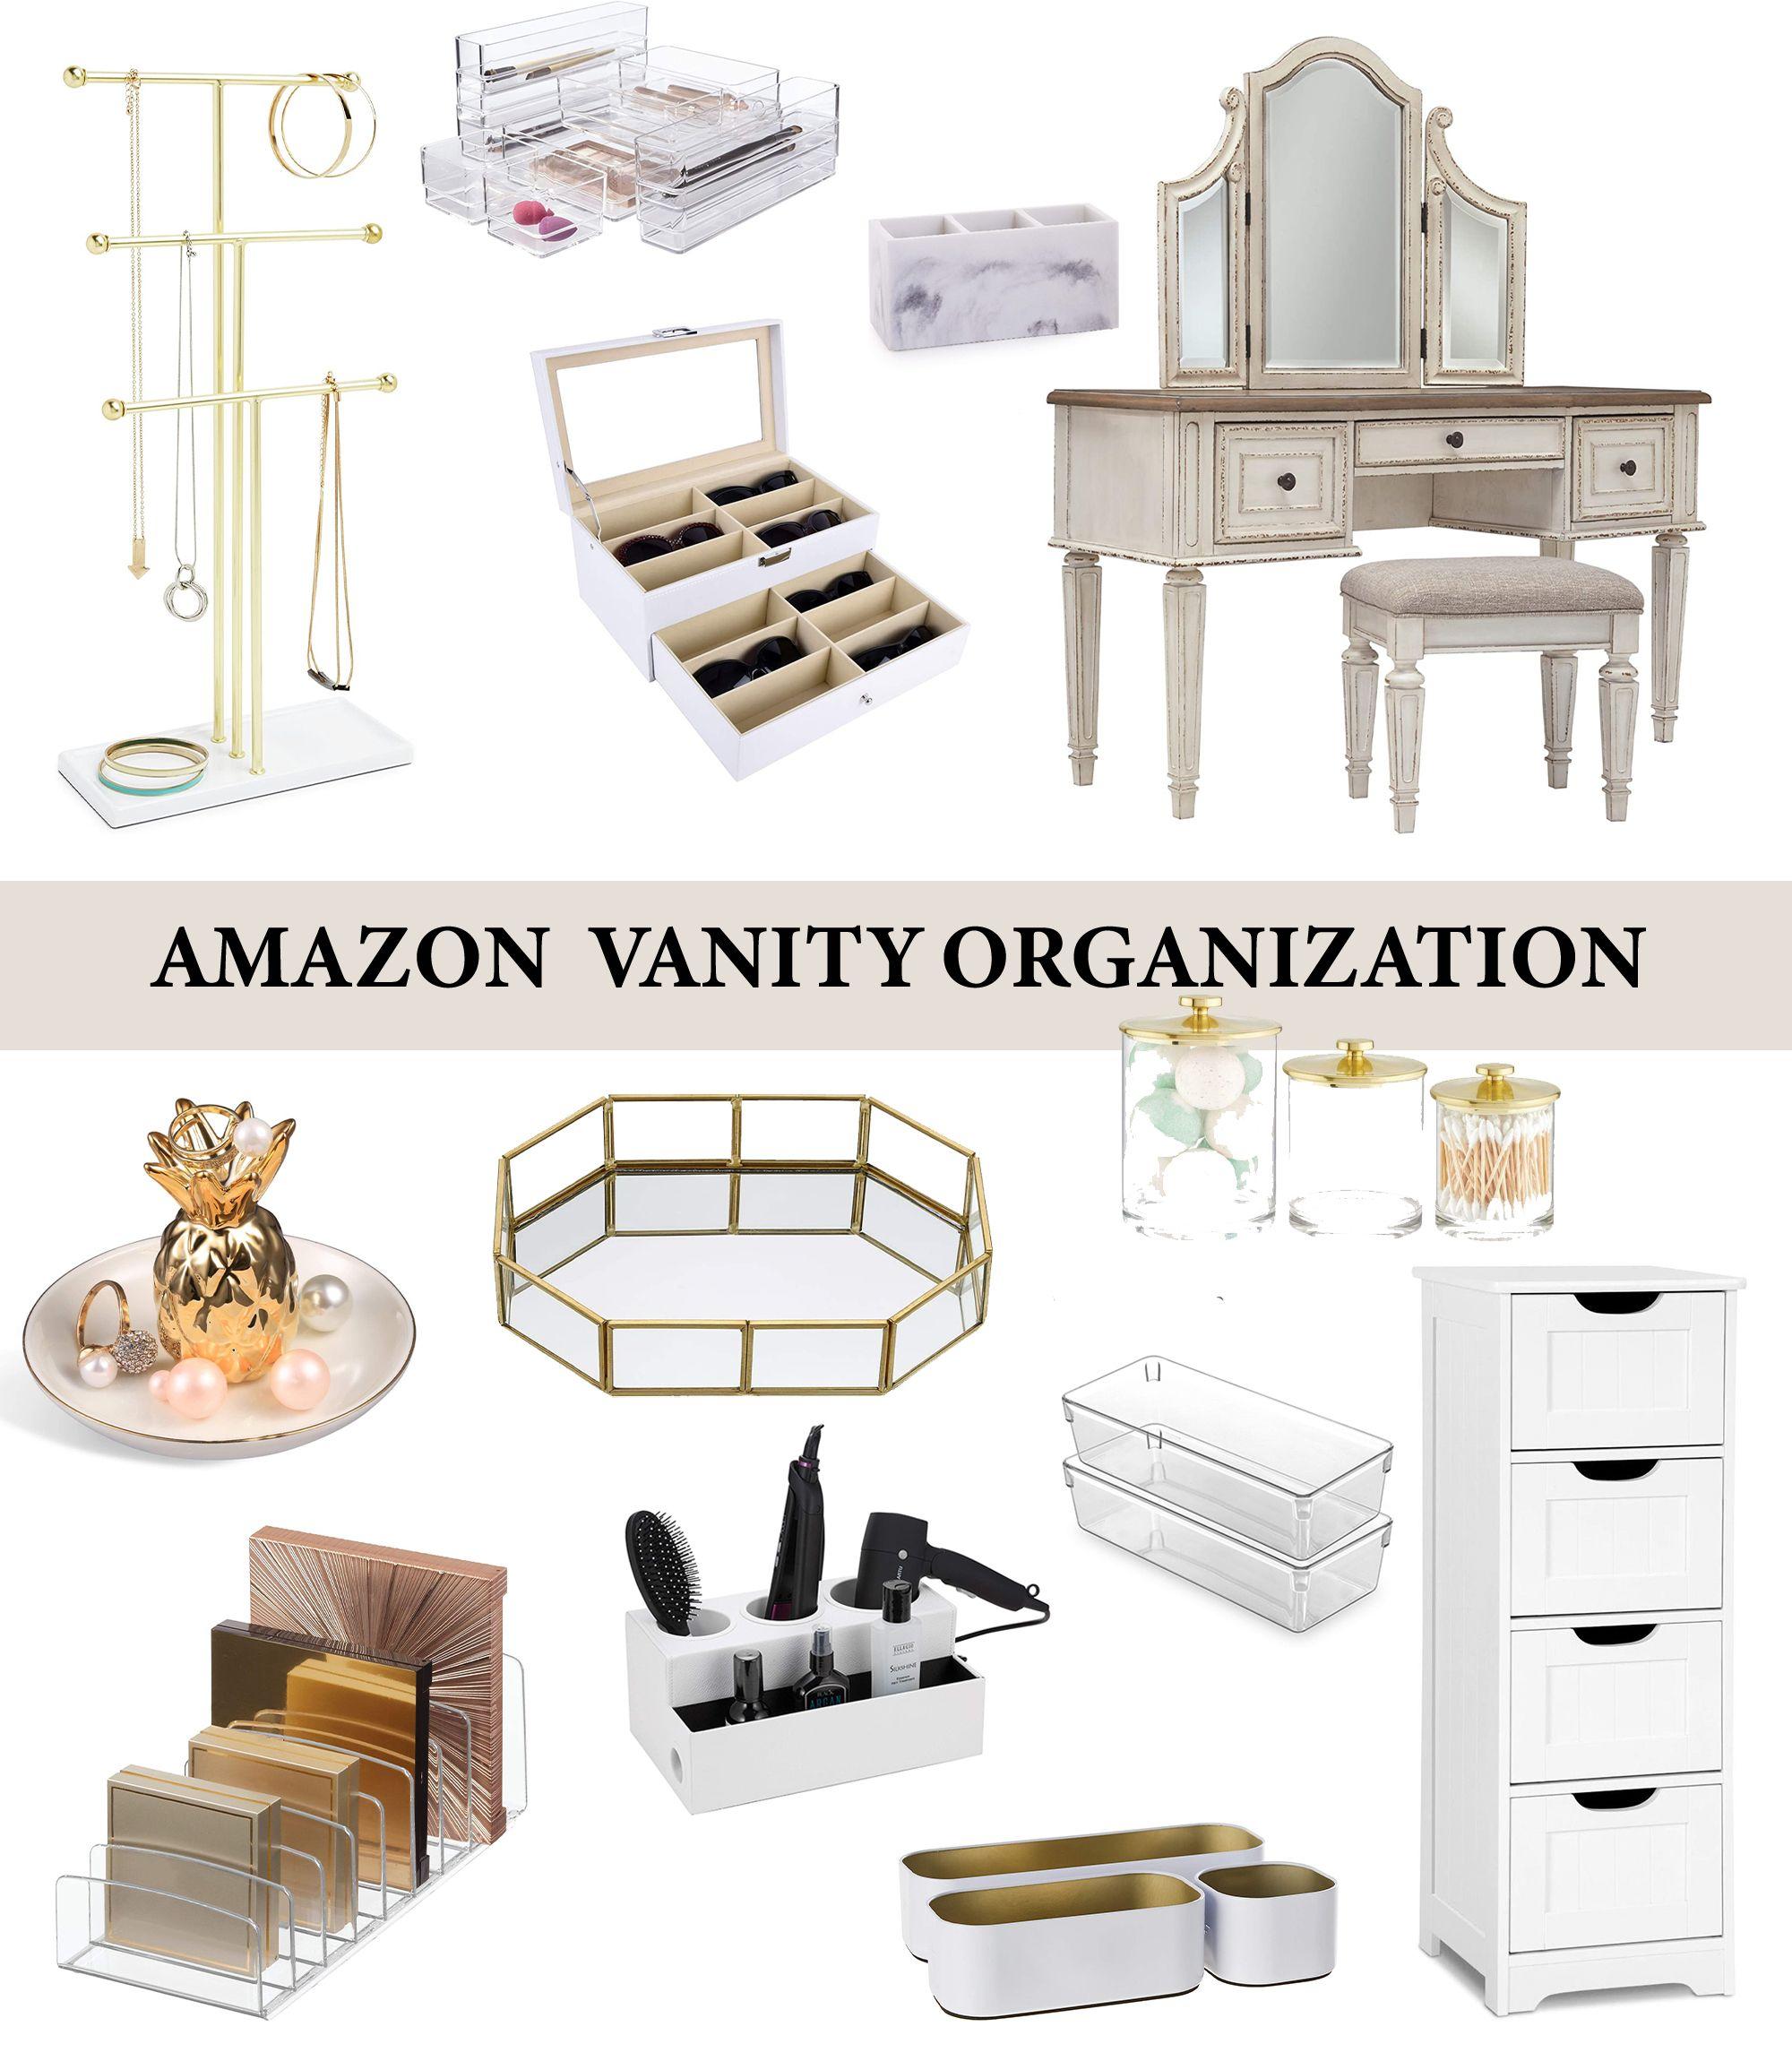 The best Amazon home decor pieces | shop these Amazon home decor pieces and Amazon furniture now including my favorite Amazon organization pieces and essentials #amazonhomedecor #amazondecor #amazonfurniture